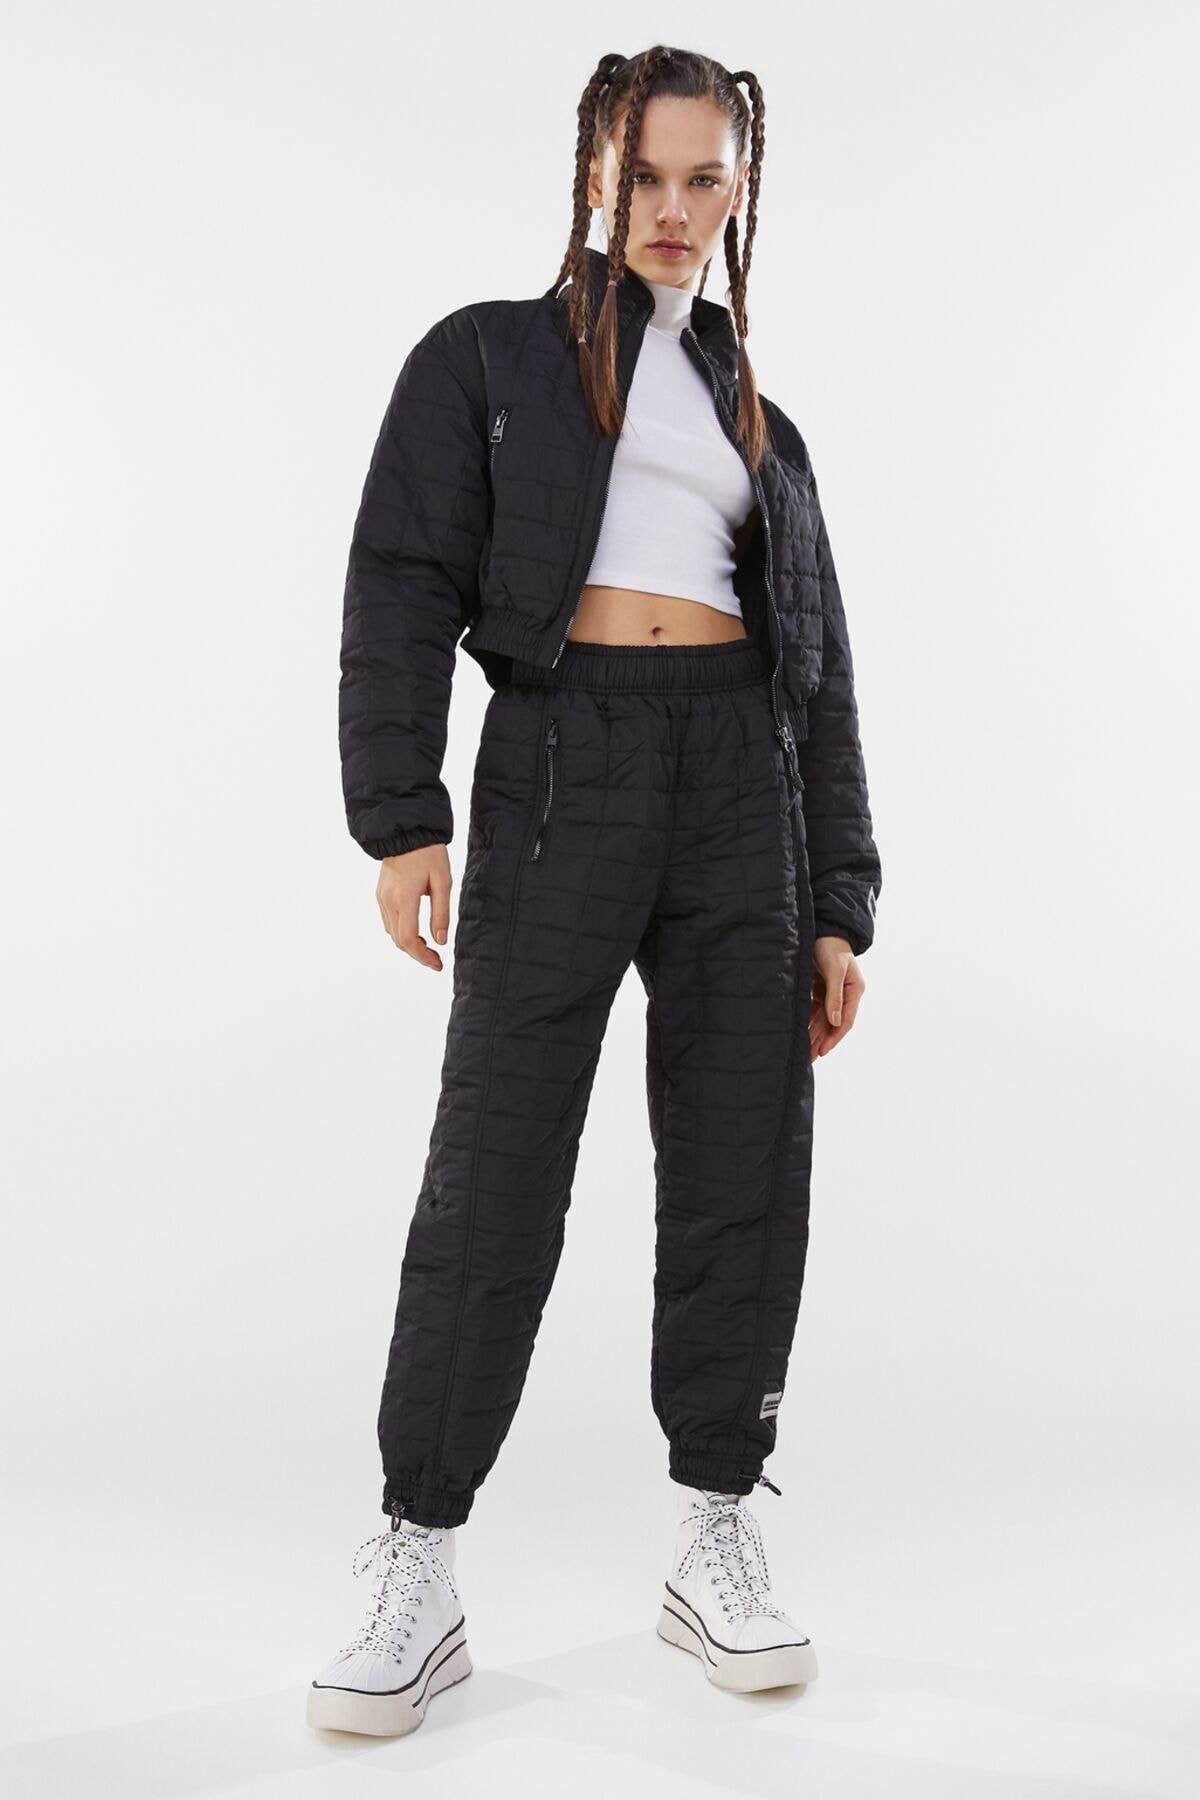 Bershka Kadın Siyah Crop Fit Kapitone Ceket 3